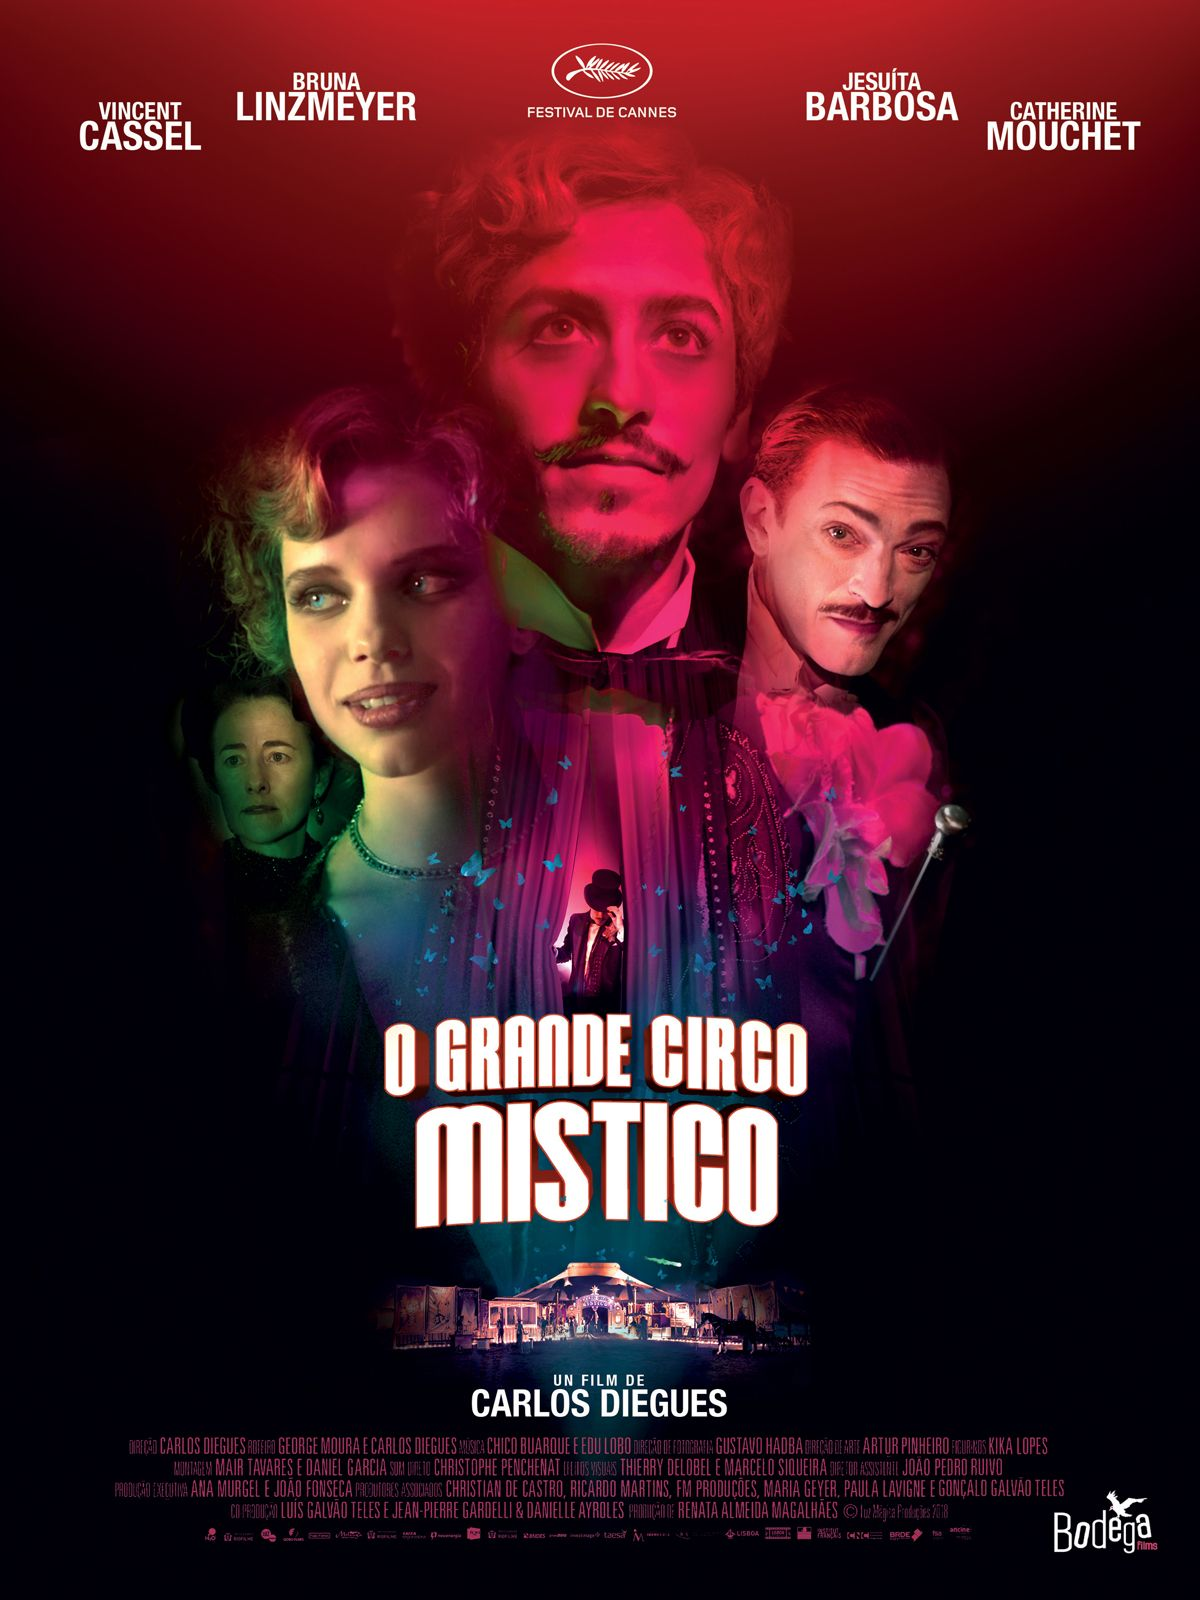 O Grande Circo Mistico Est Un Film Realise Par Carlos Diegues Avec